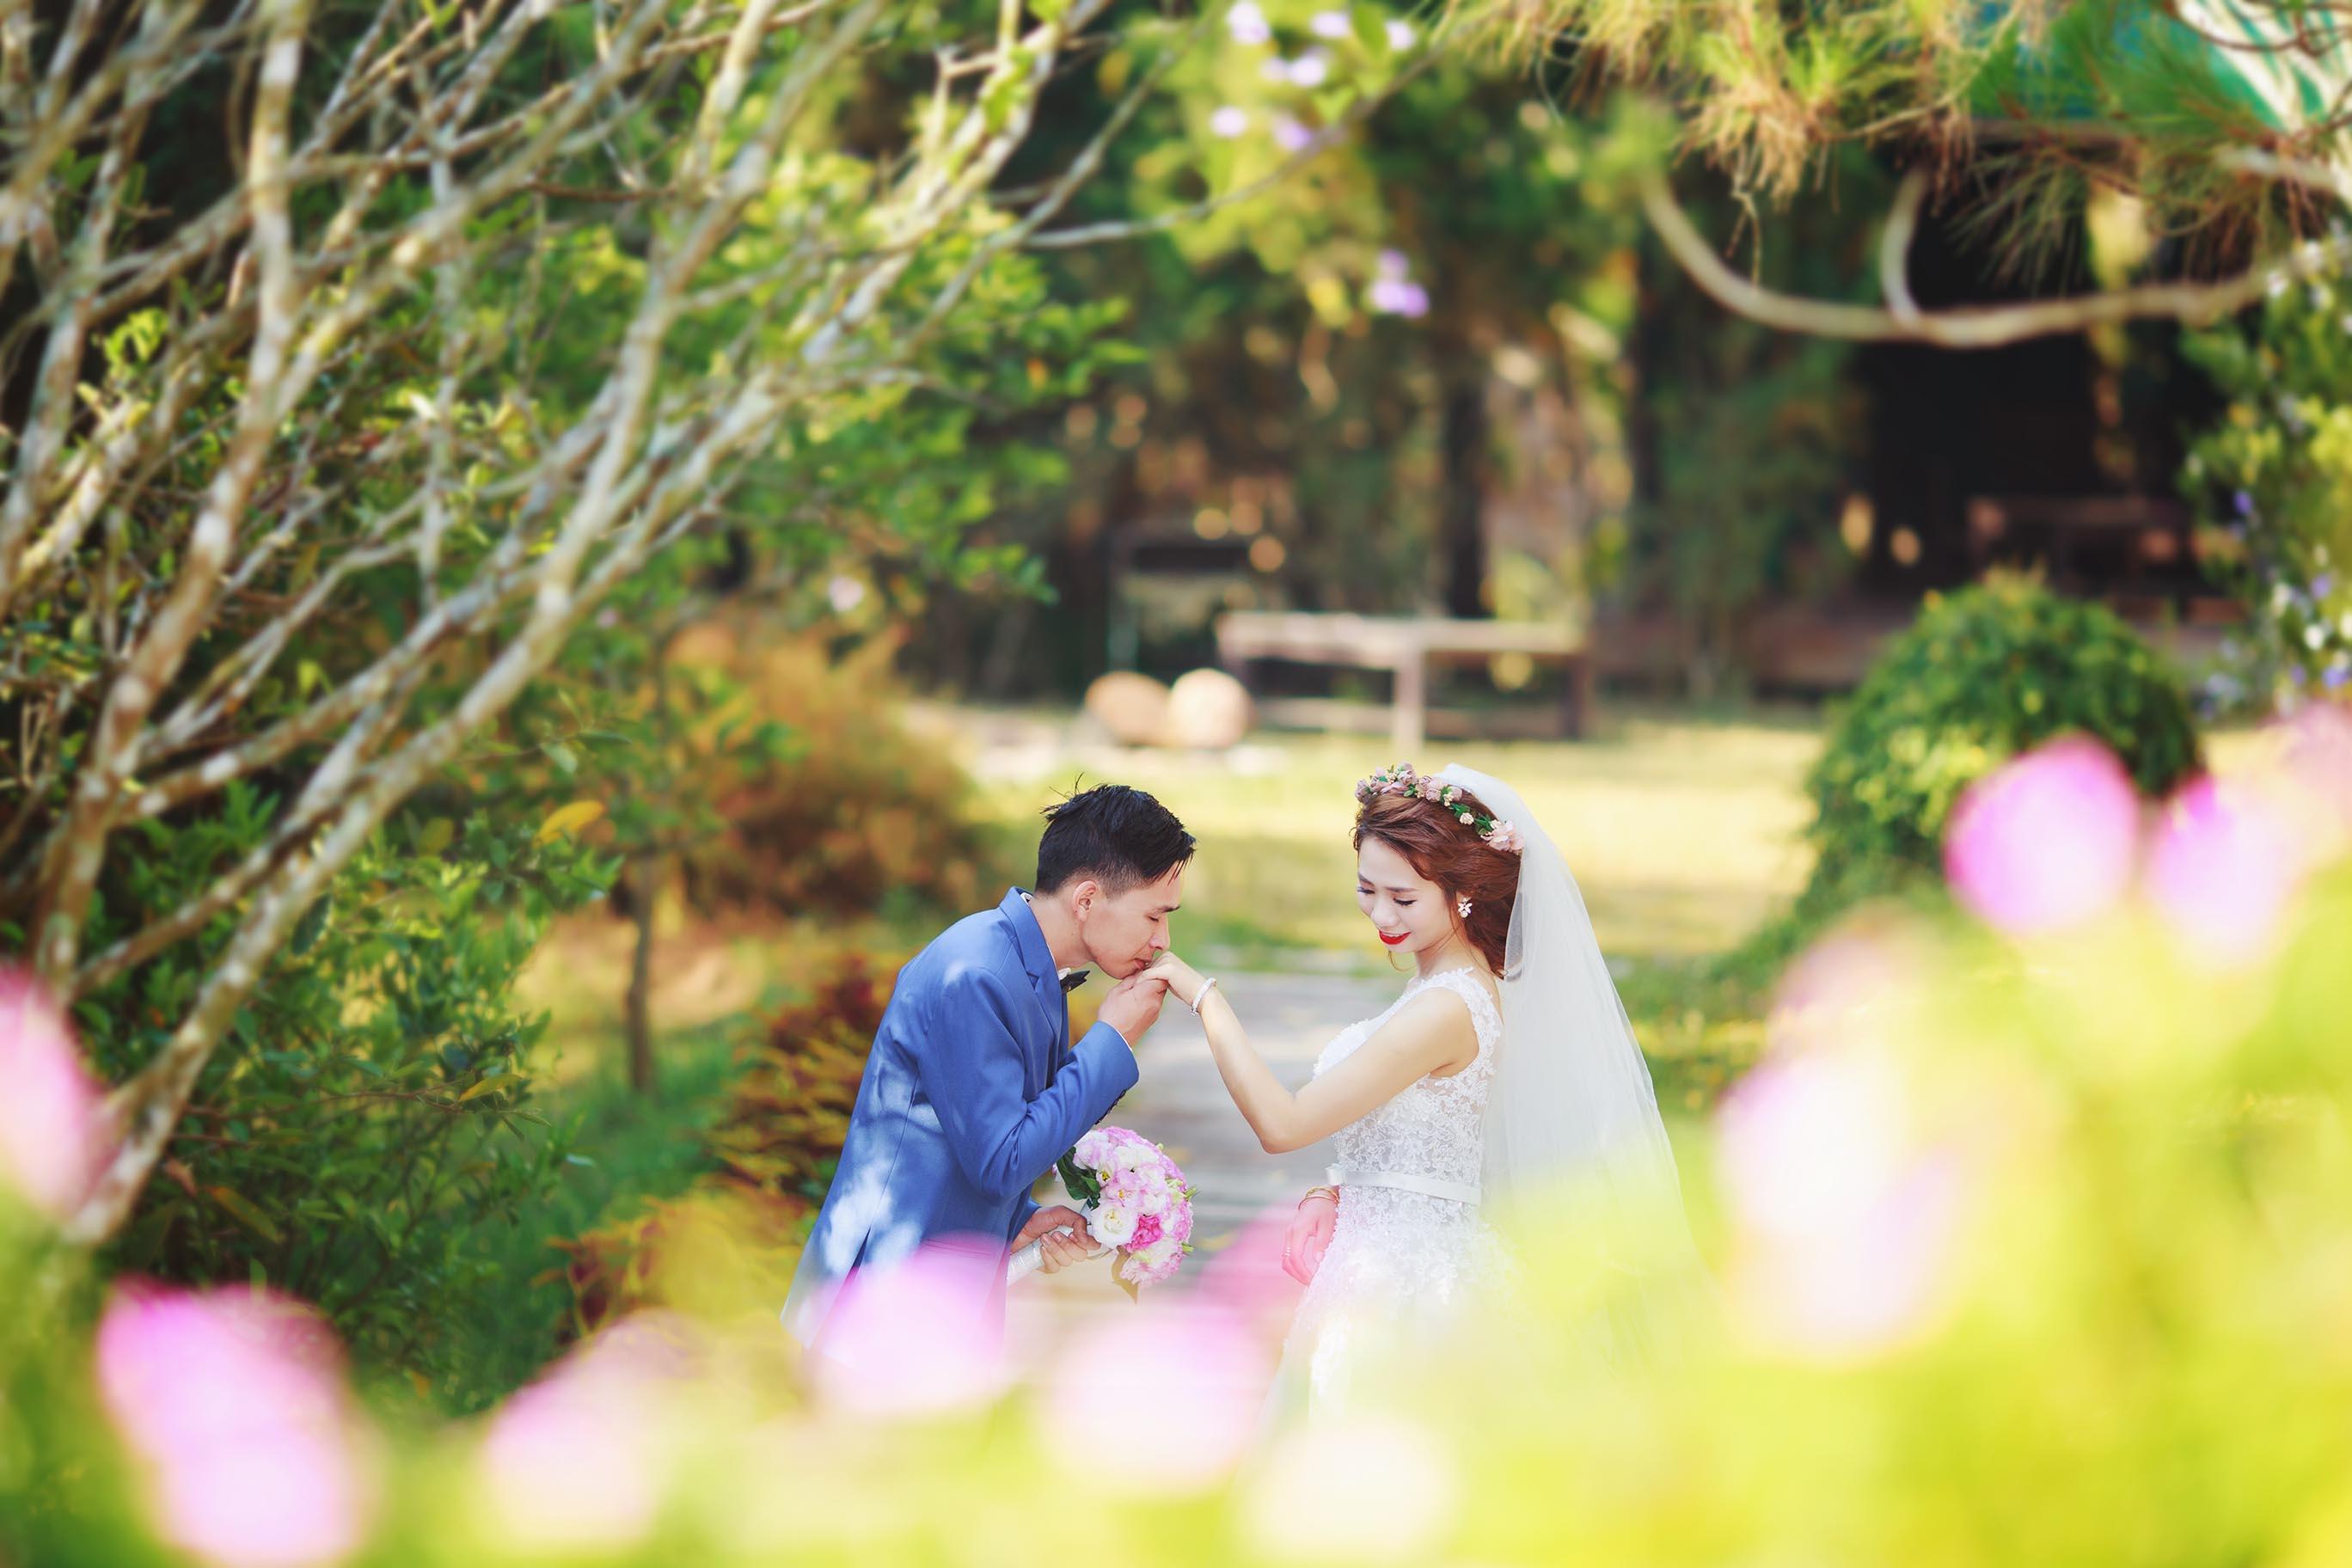 alohastudio-wedding-dia-chi-studio-chup-hinh-cuoi-dep-tai-tp-hcm-16